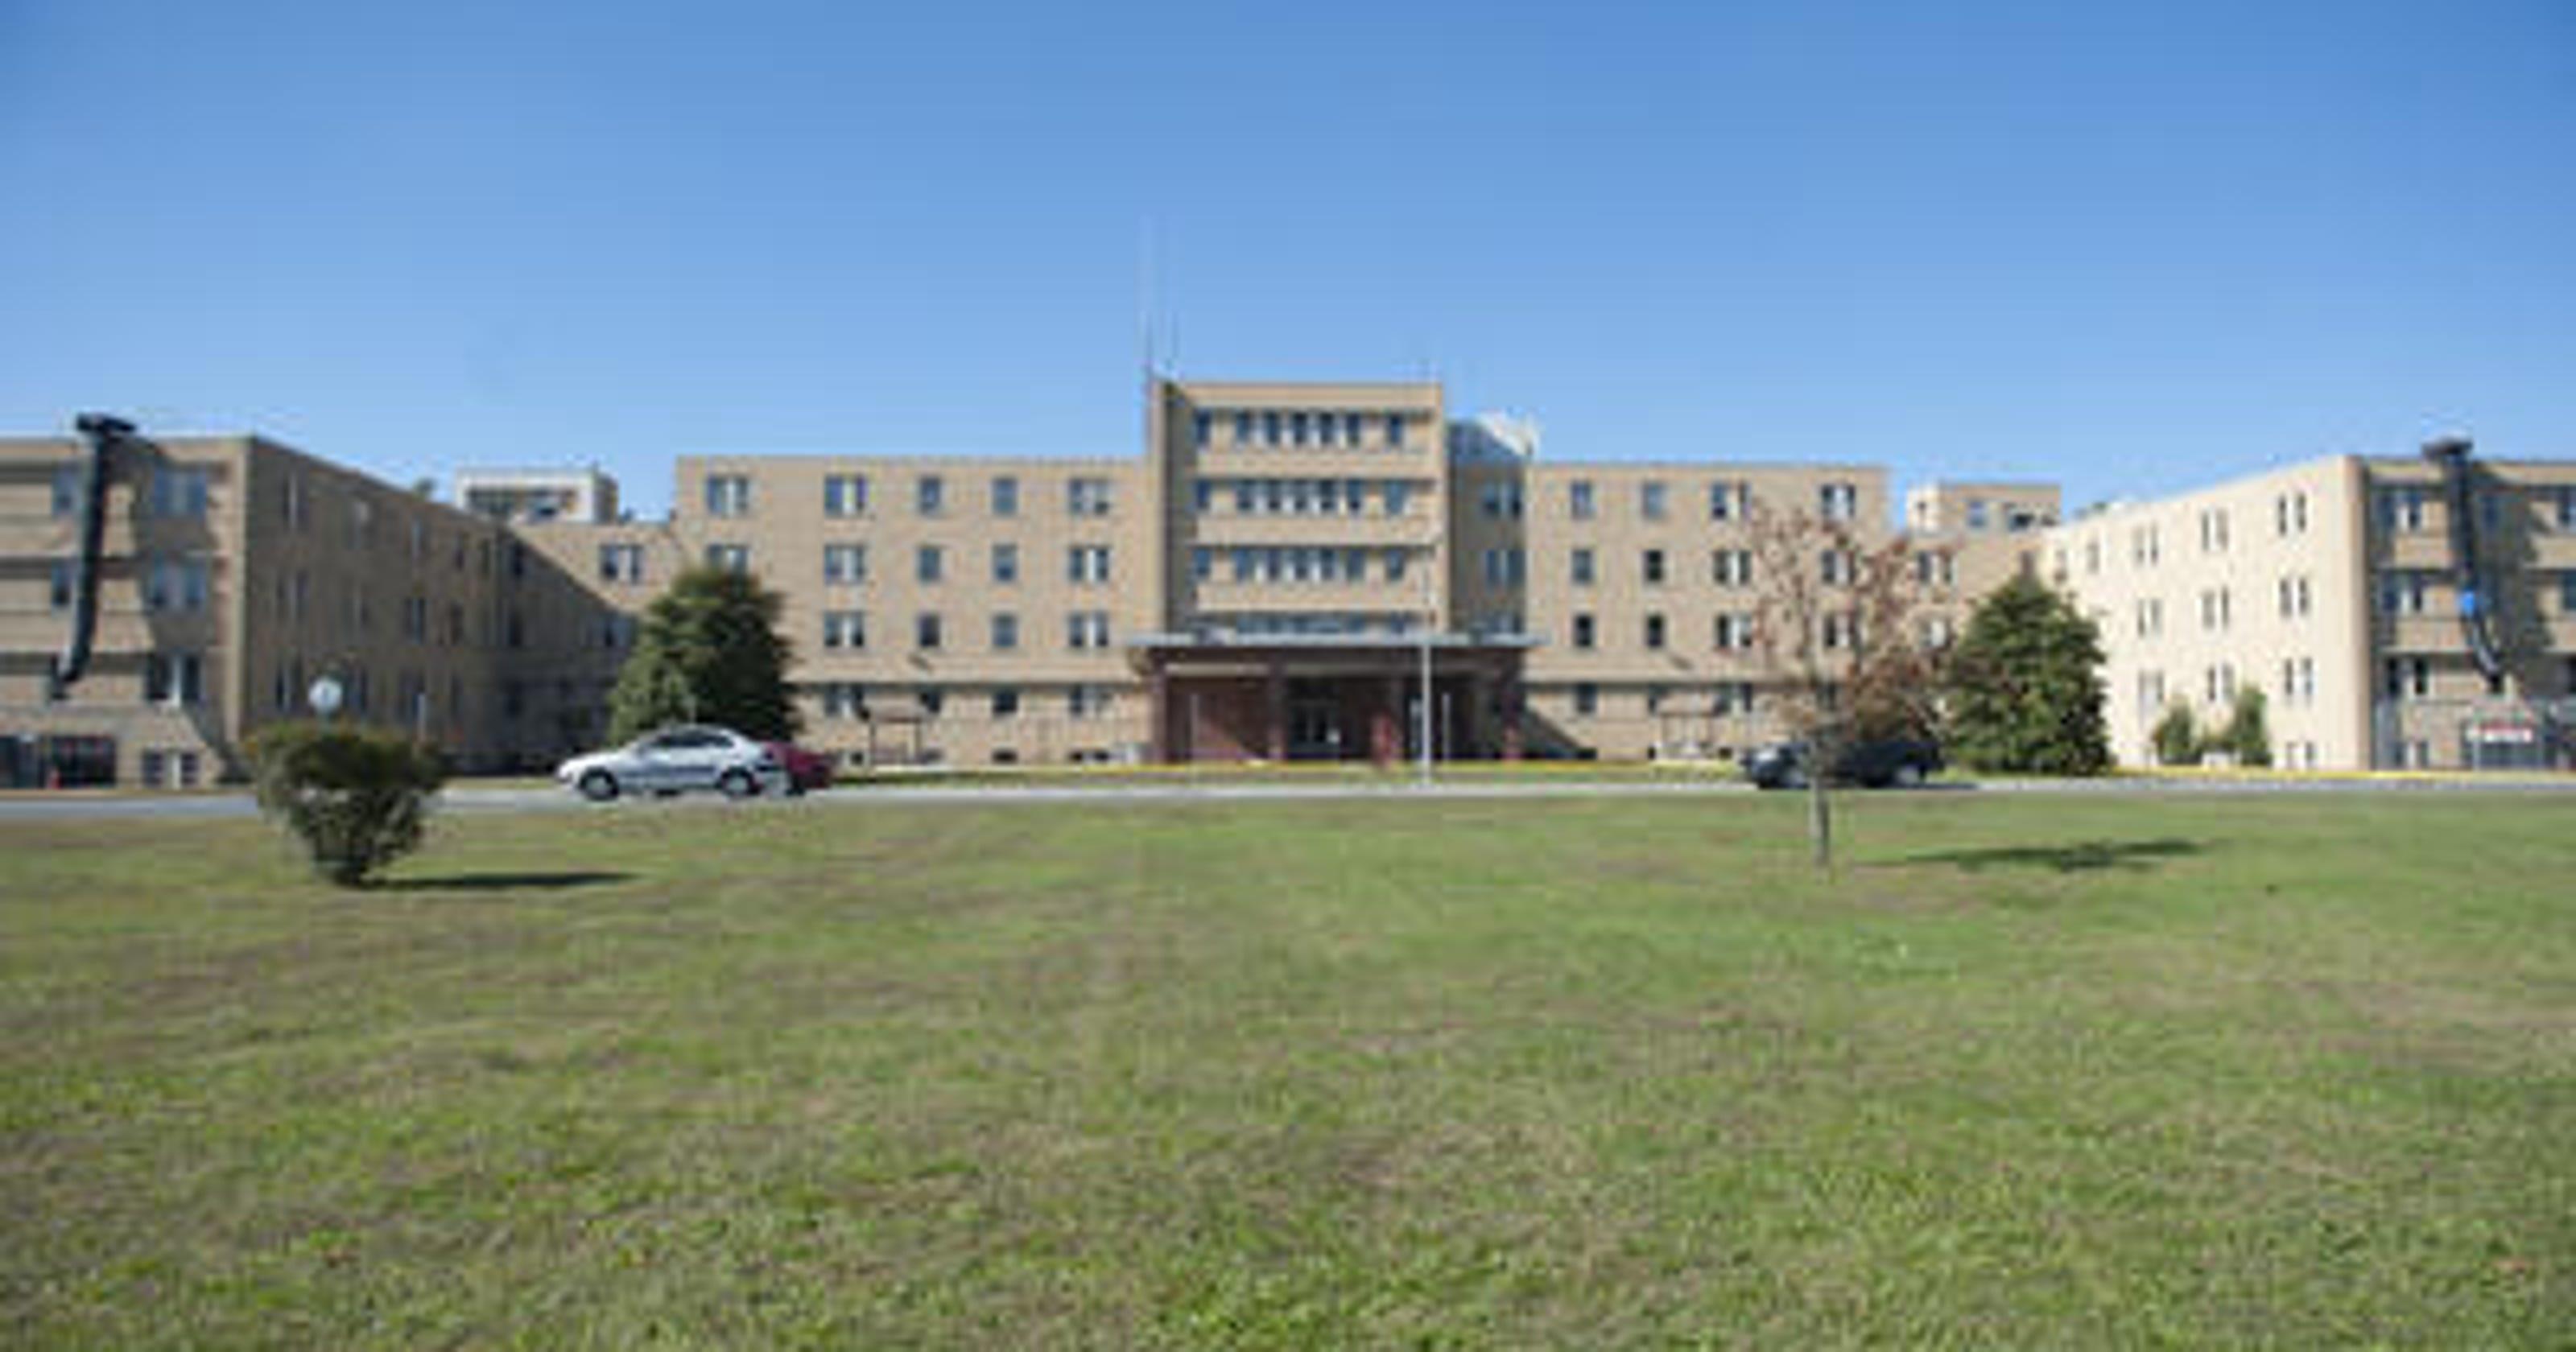 Ancora S Violence Highest Among Nj Psychiatric Hospitals